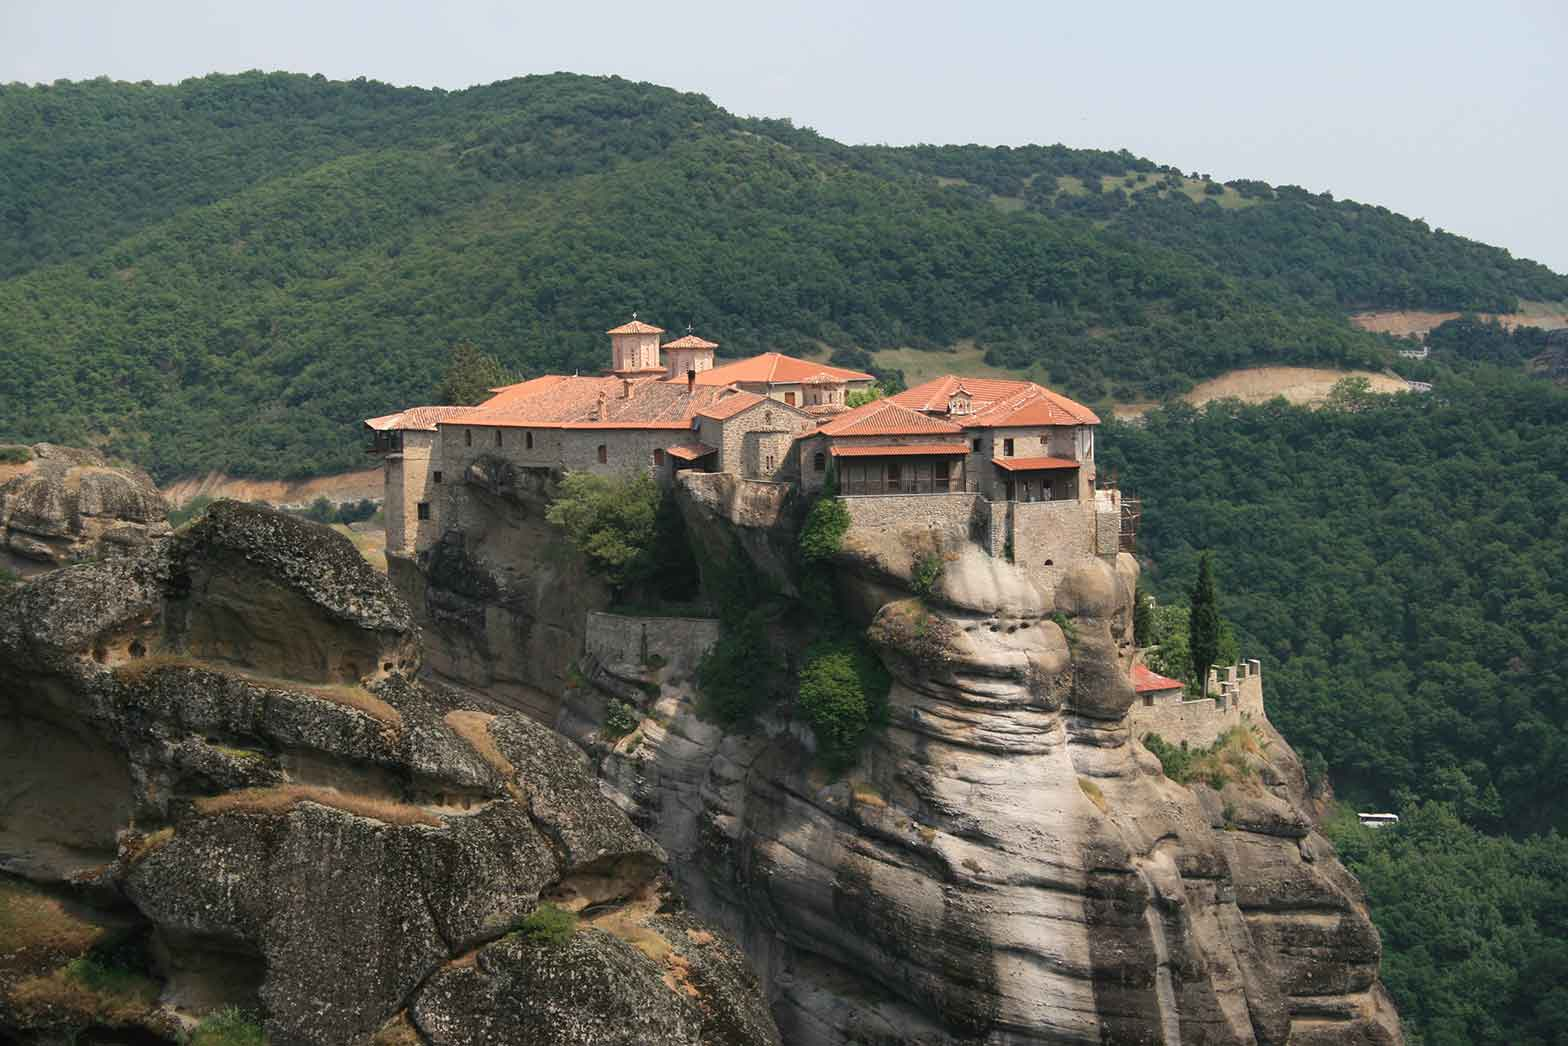 The Meteora Monasteries